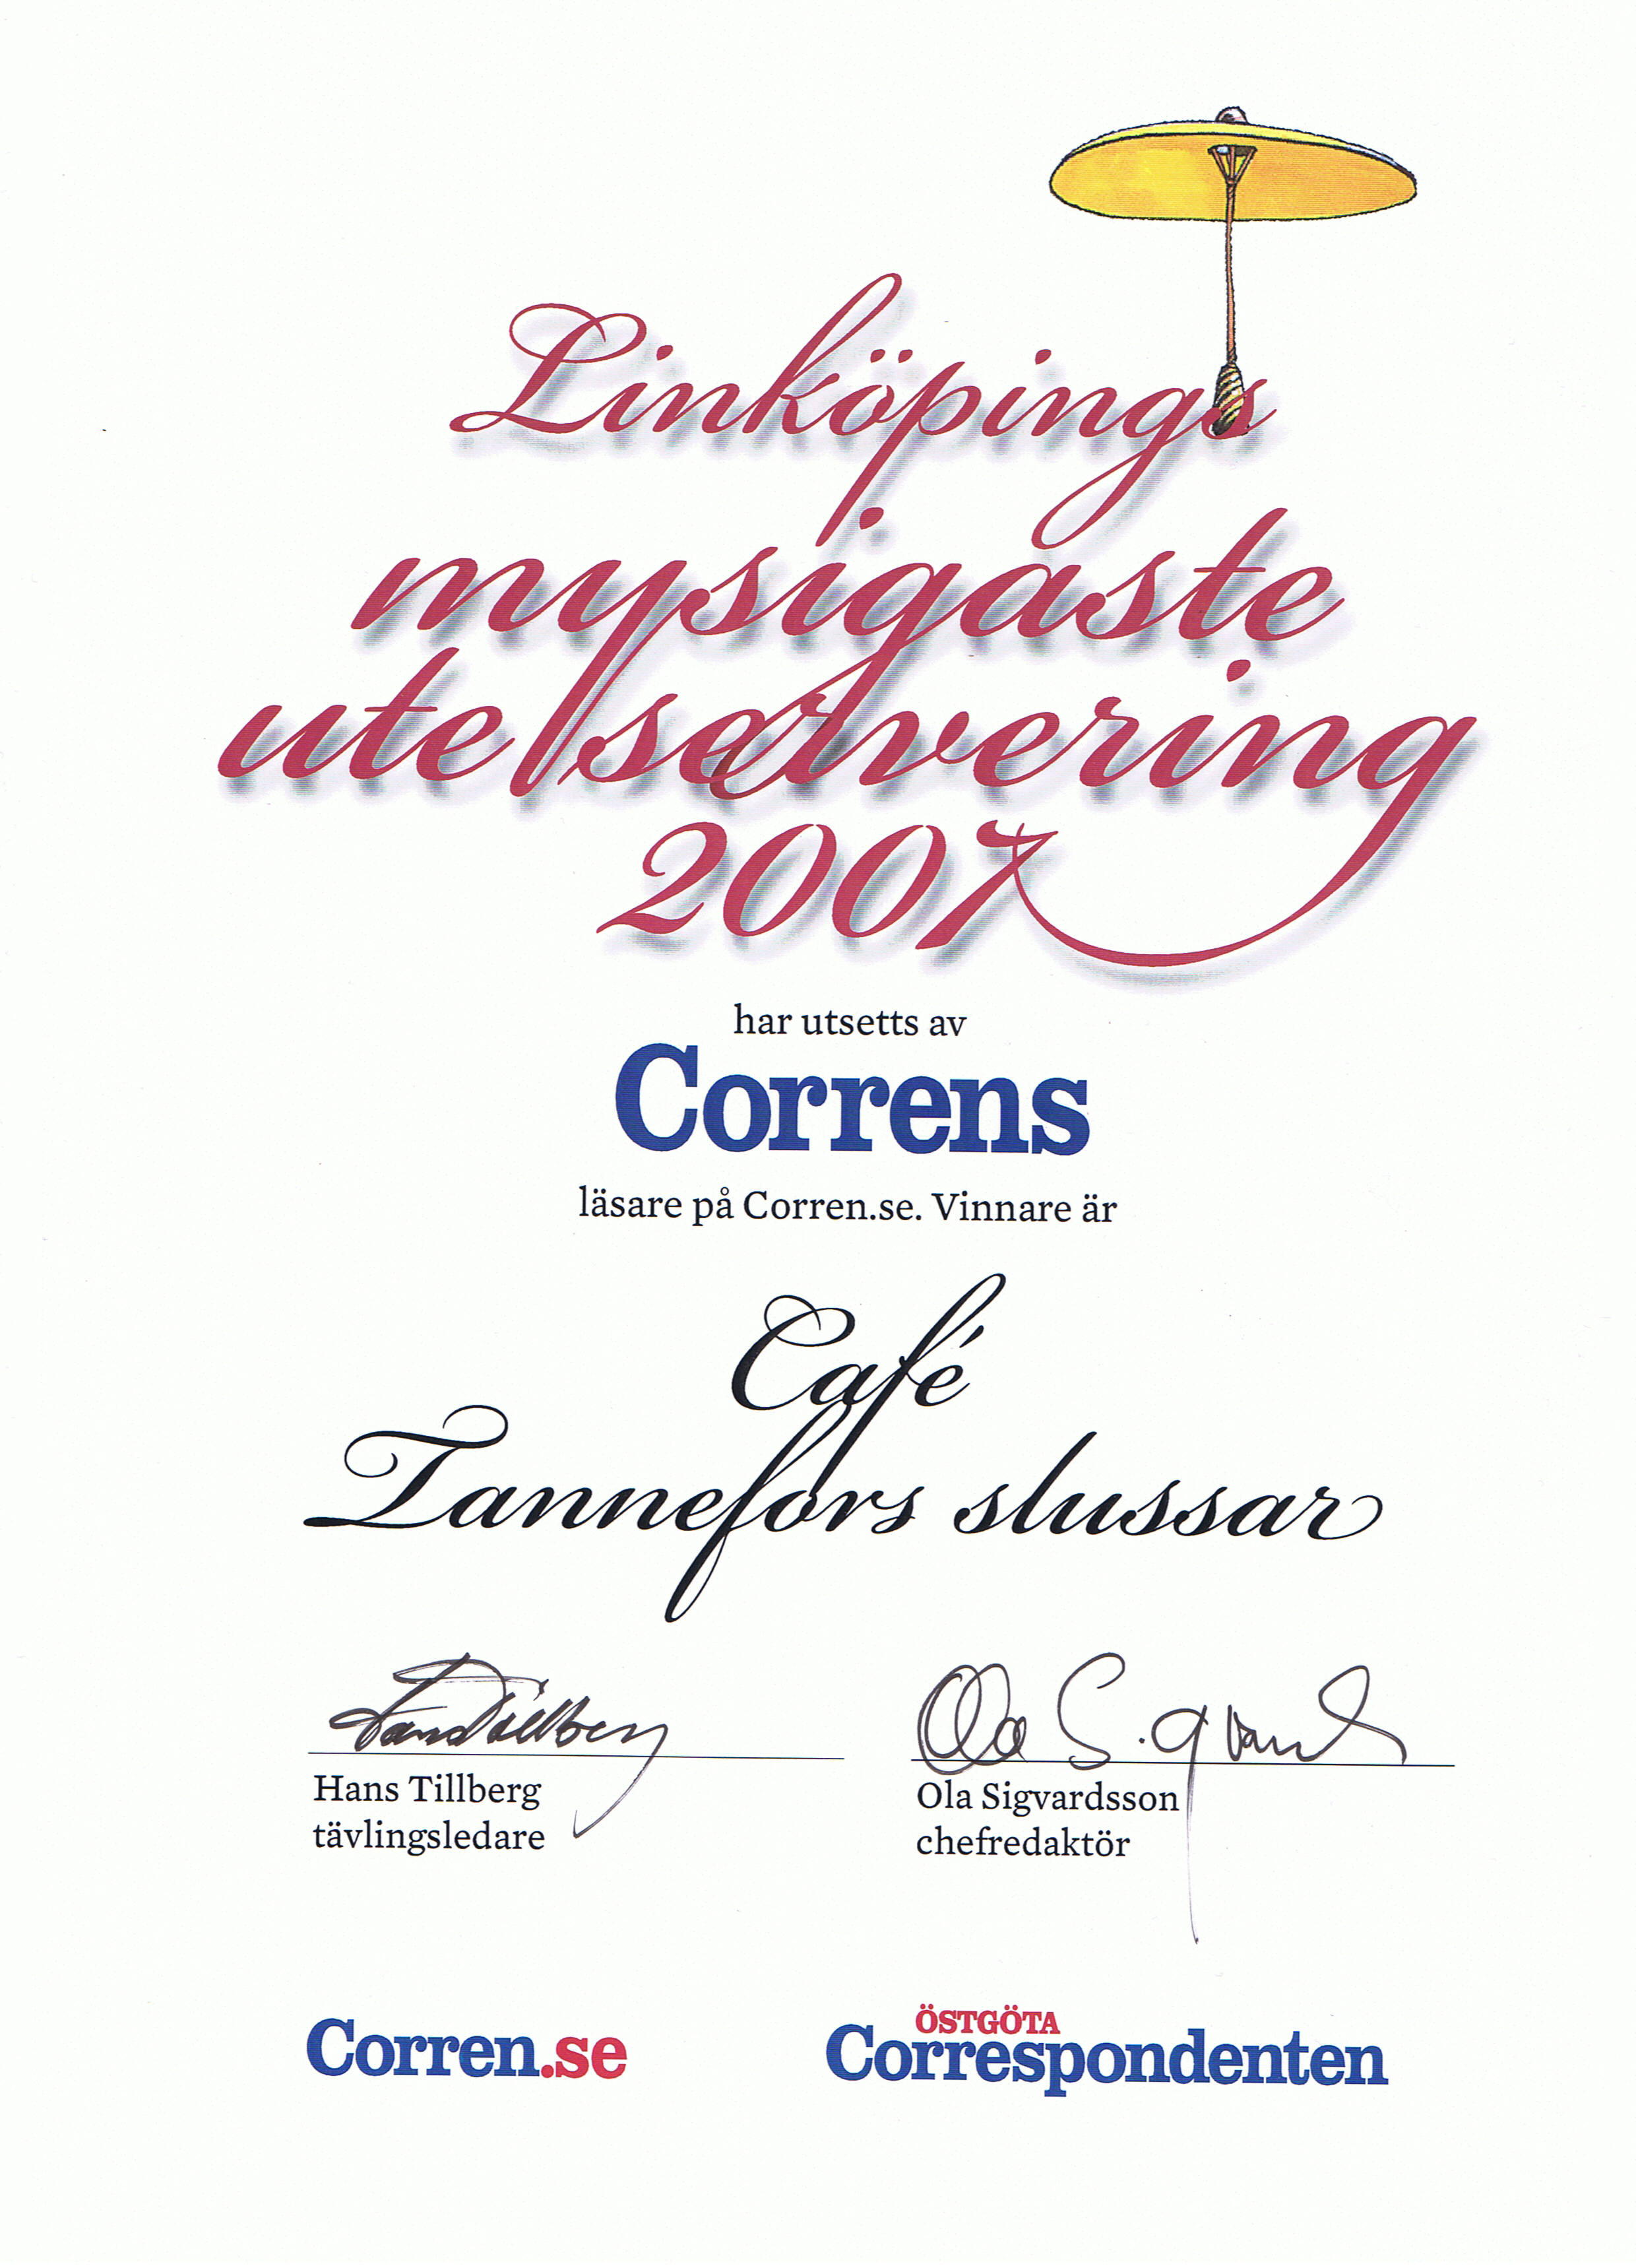 Diplom Linköpings mysigaste uteservering